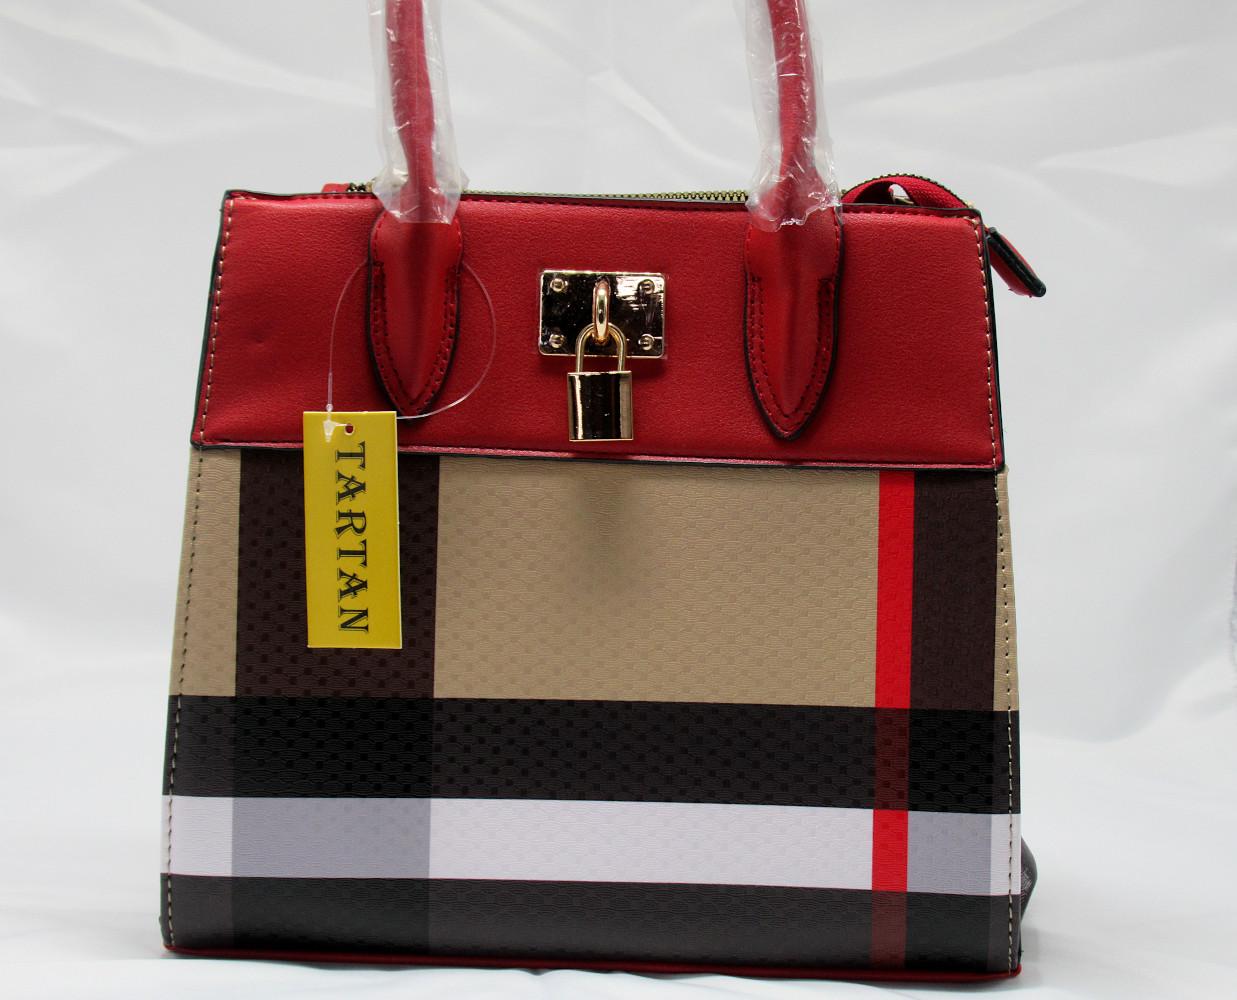 Red and Plaid Check Padlock 2-in-1 Bag-lock2